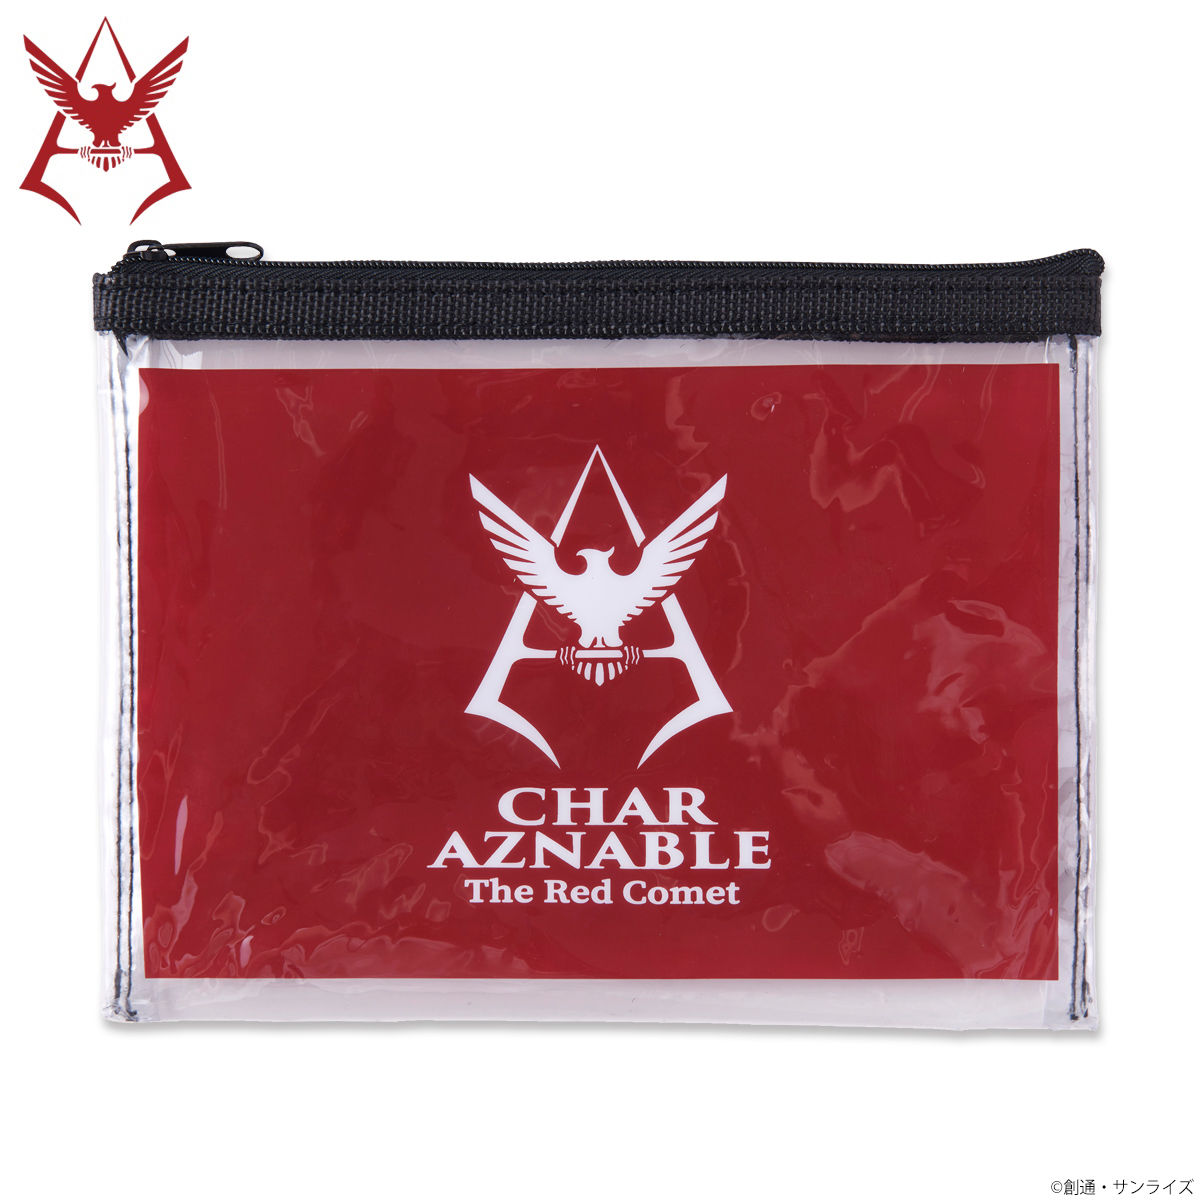 Mobile Suit Gundam Cosmetics Pouch